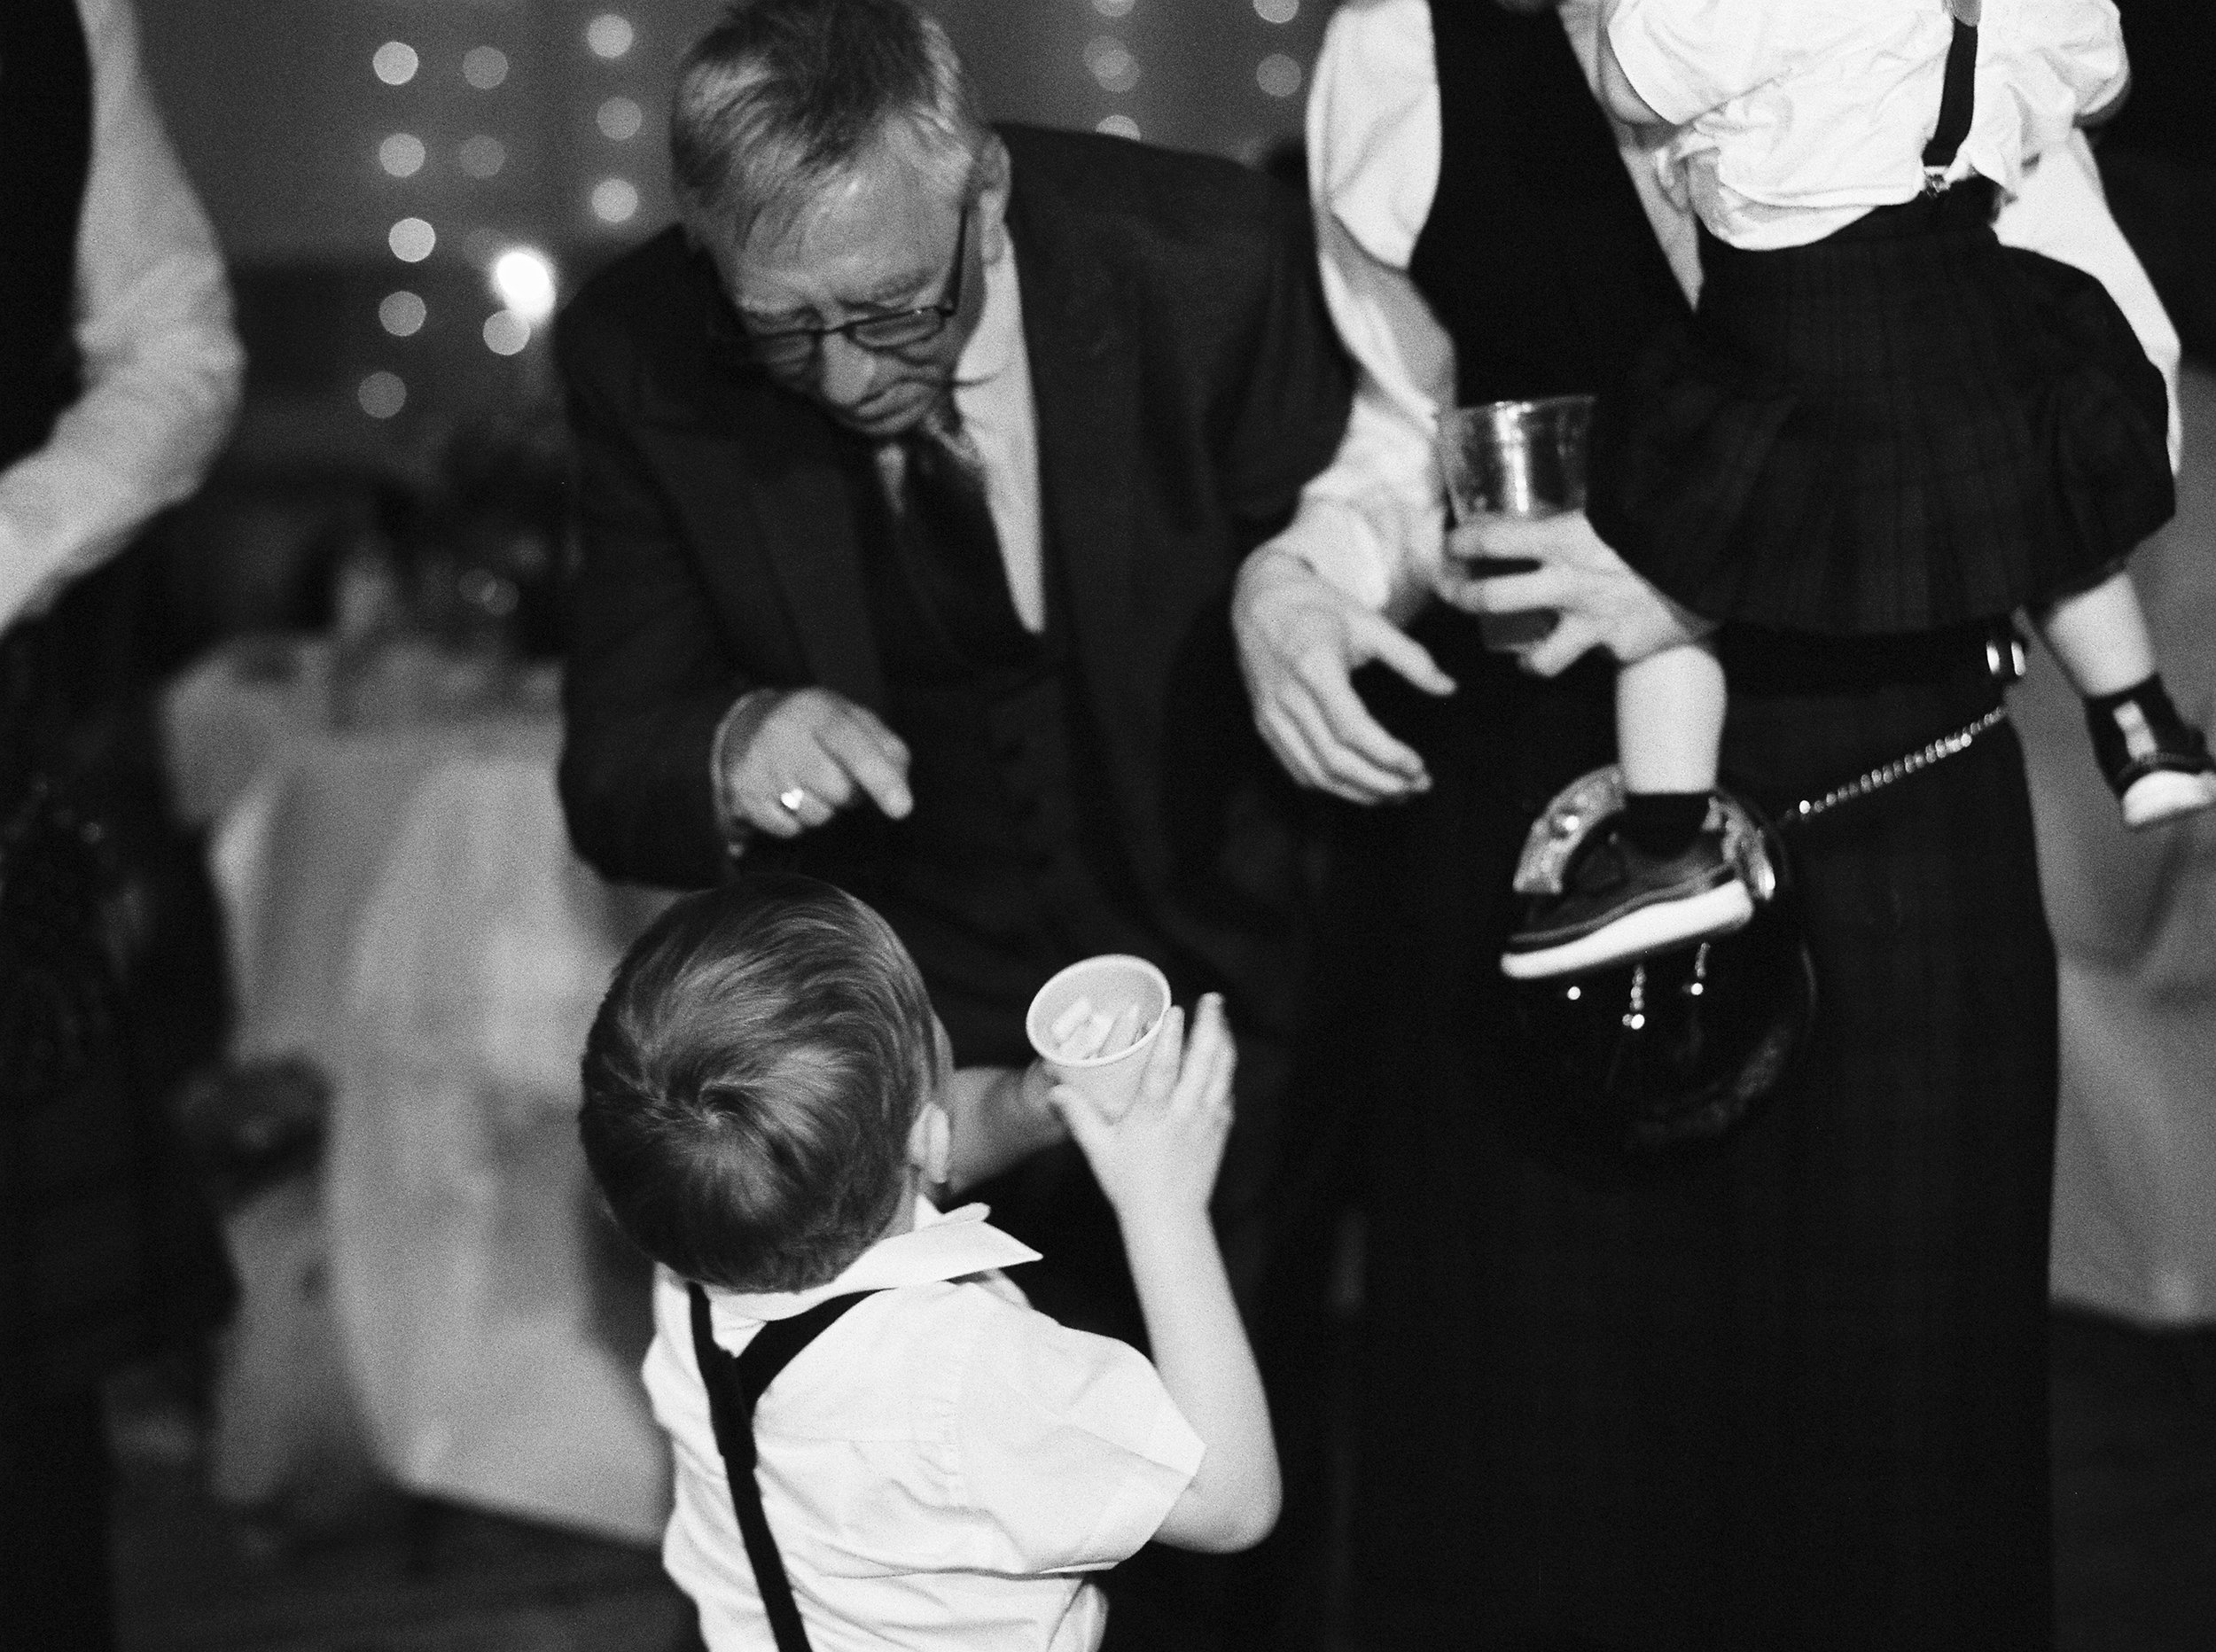 wedding-photography-scotland122.jpg